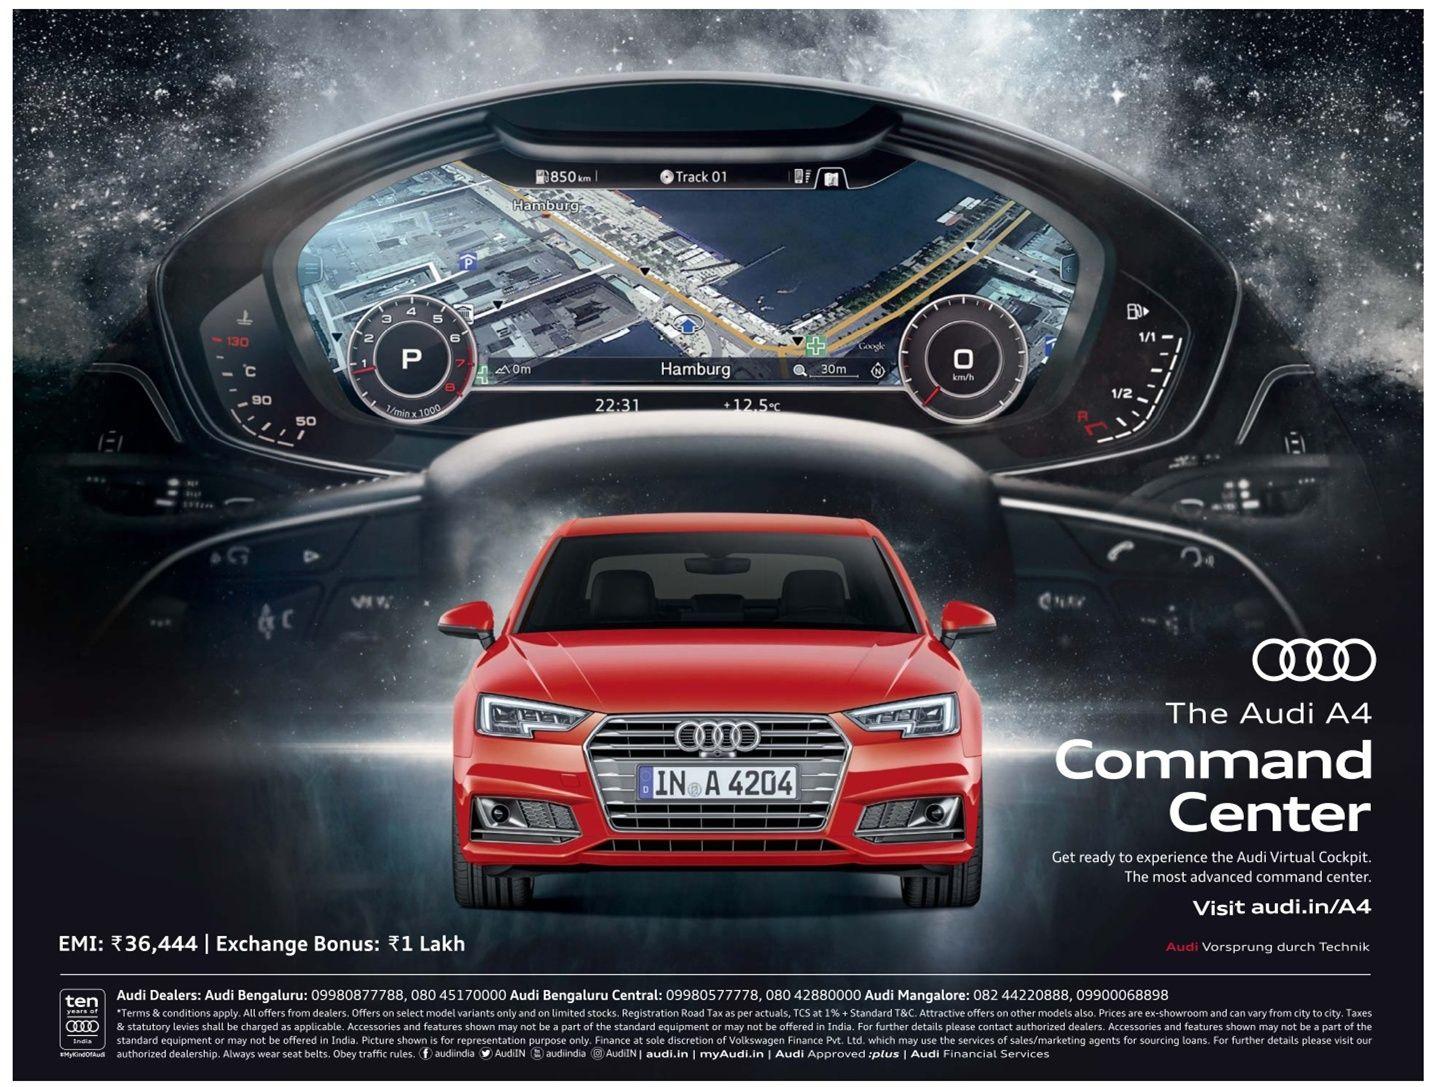 The Audi A4 Command Center Ad Car Advertising Audi Car Advertising Design